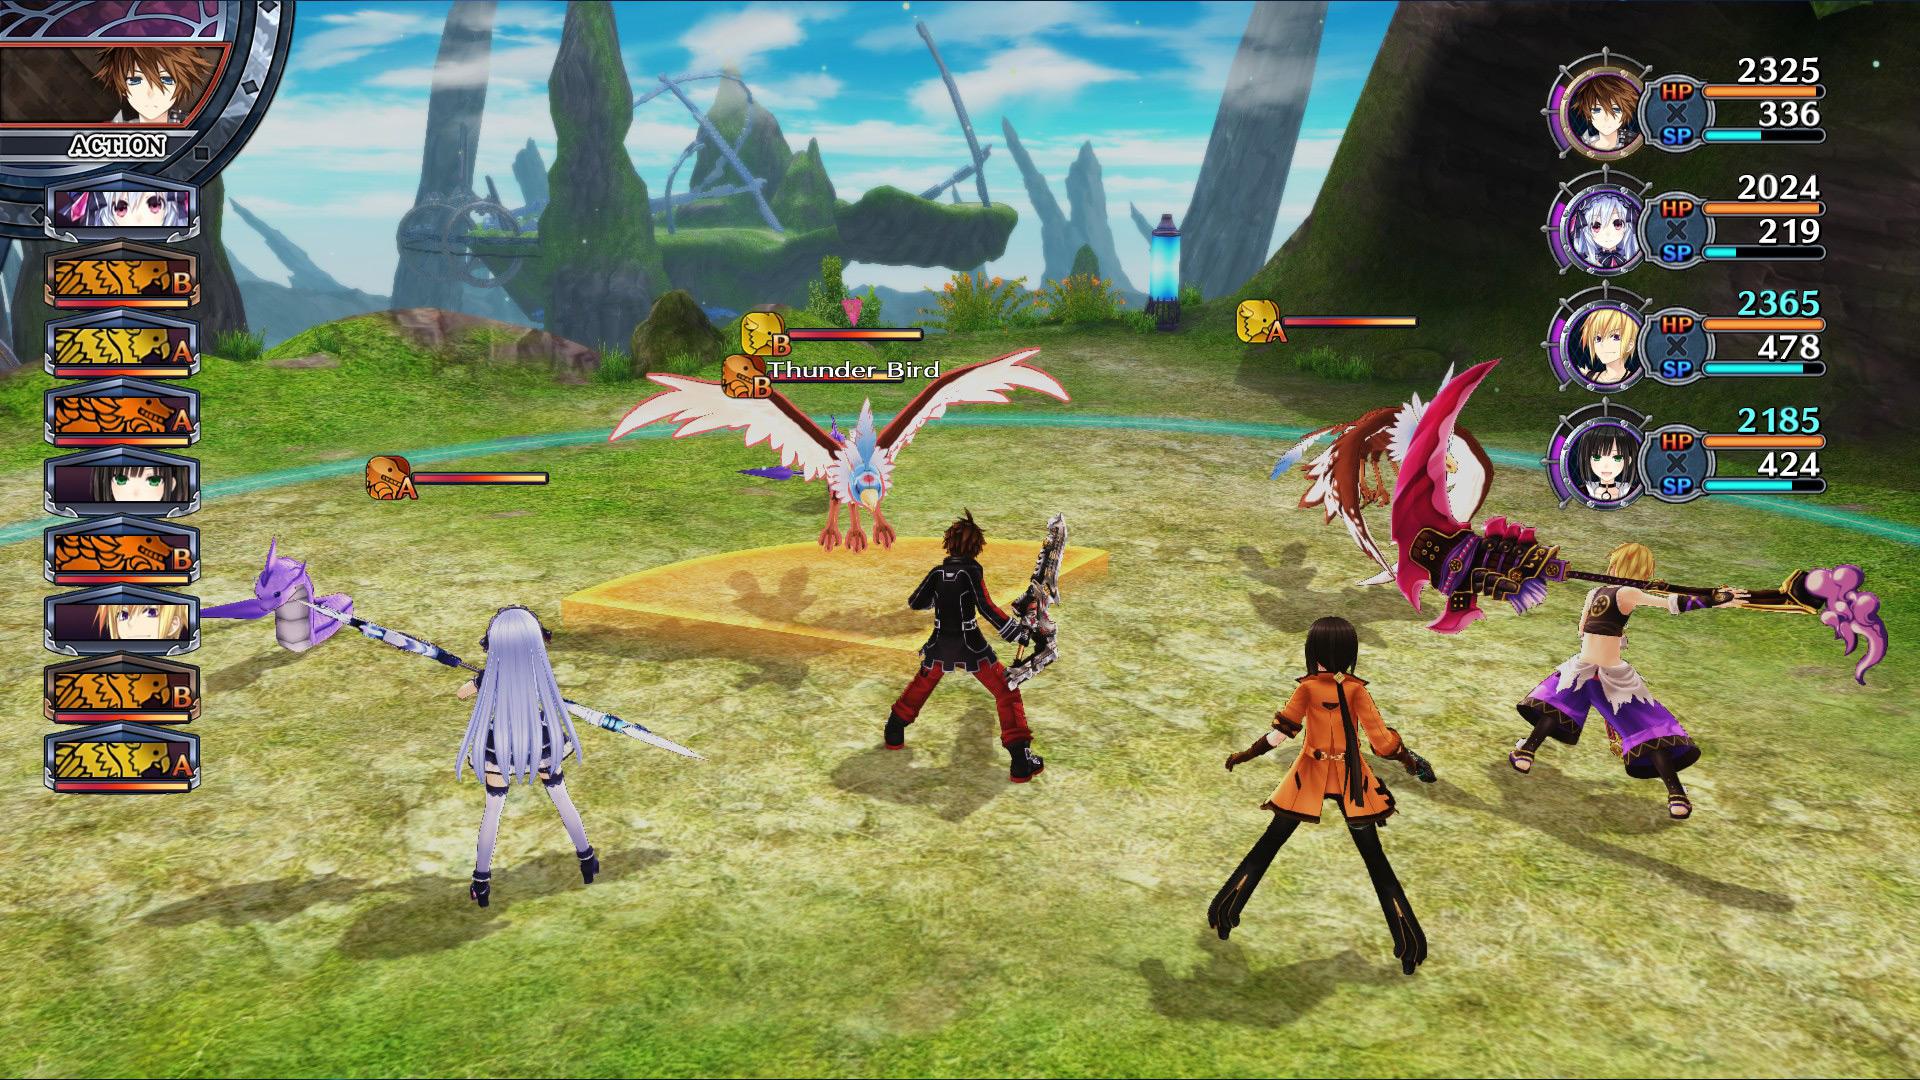 Fairy Fencer F Advent Dark Force Game Reviews Popzara Press